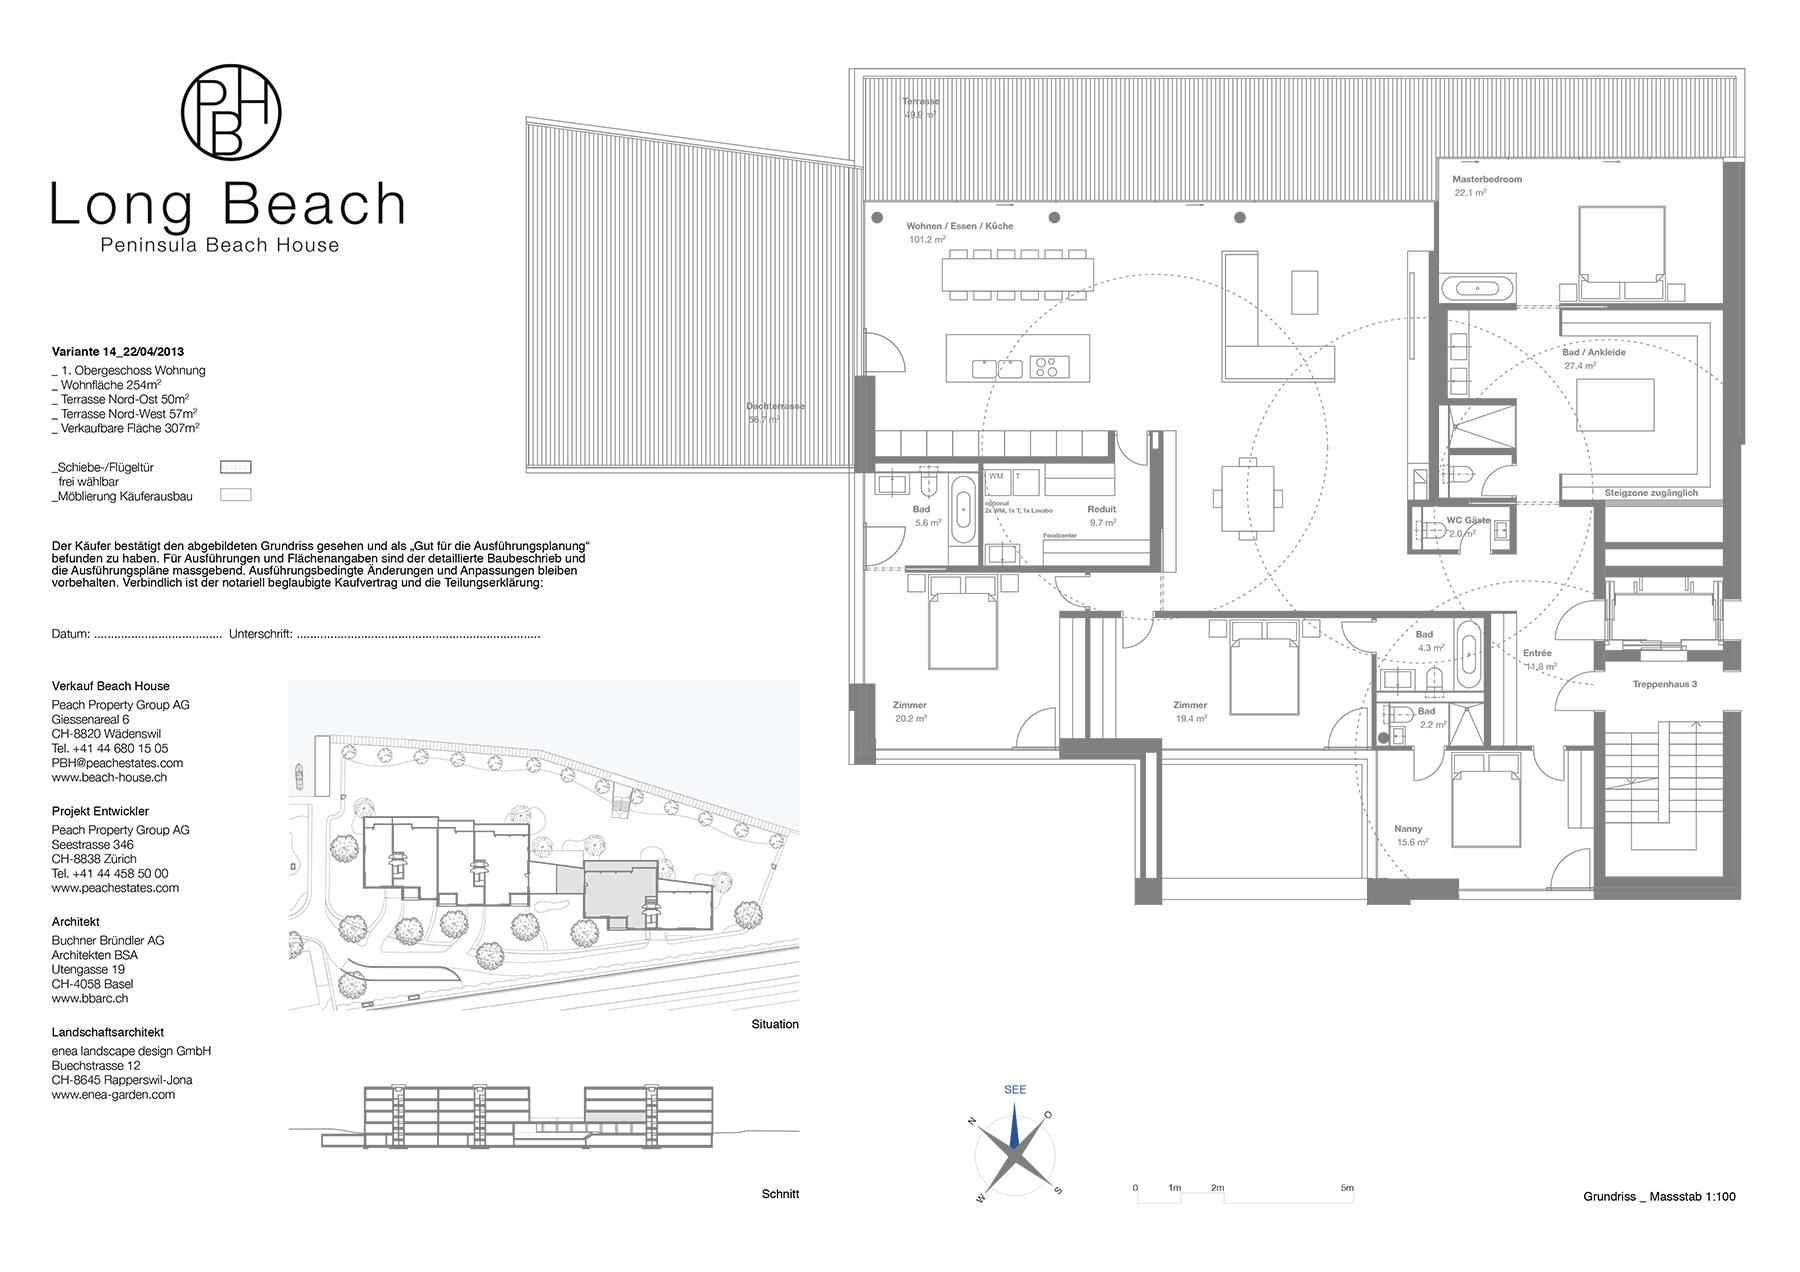 Apartment Design Requirements peninsula beach house apartment long beach – peach property group